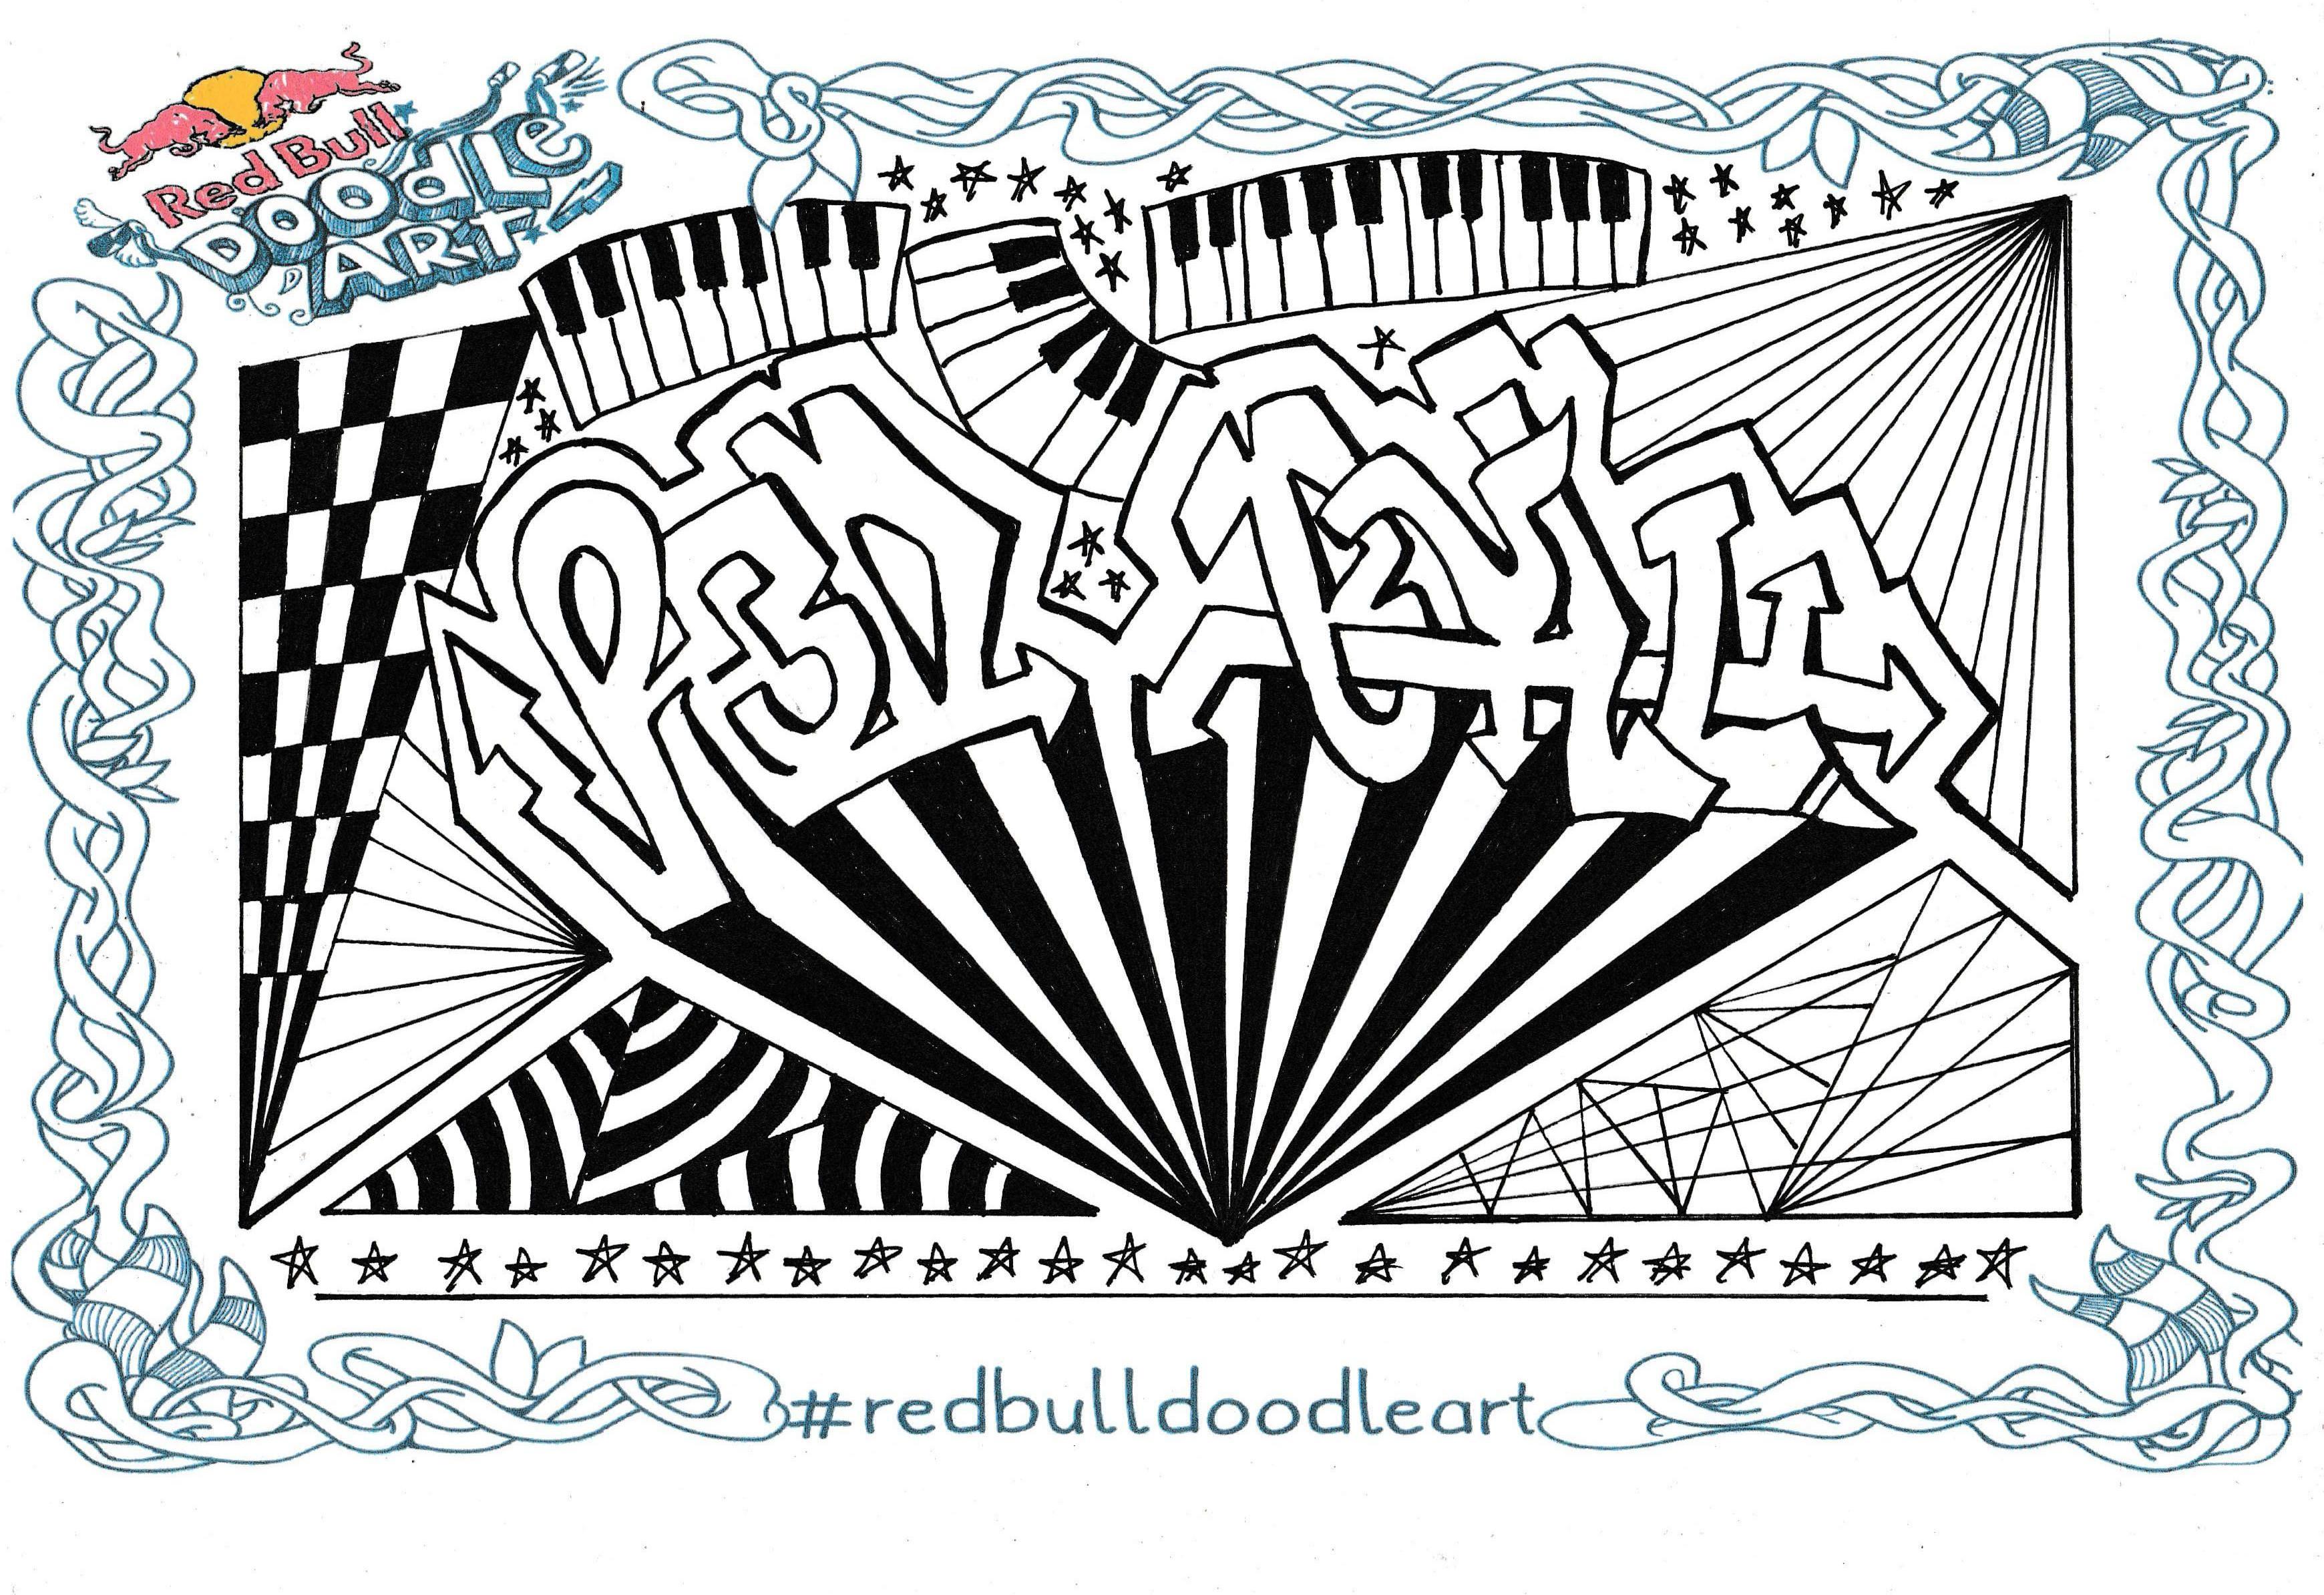 Red Bull Doodle Art